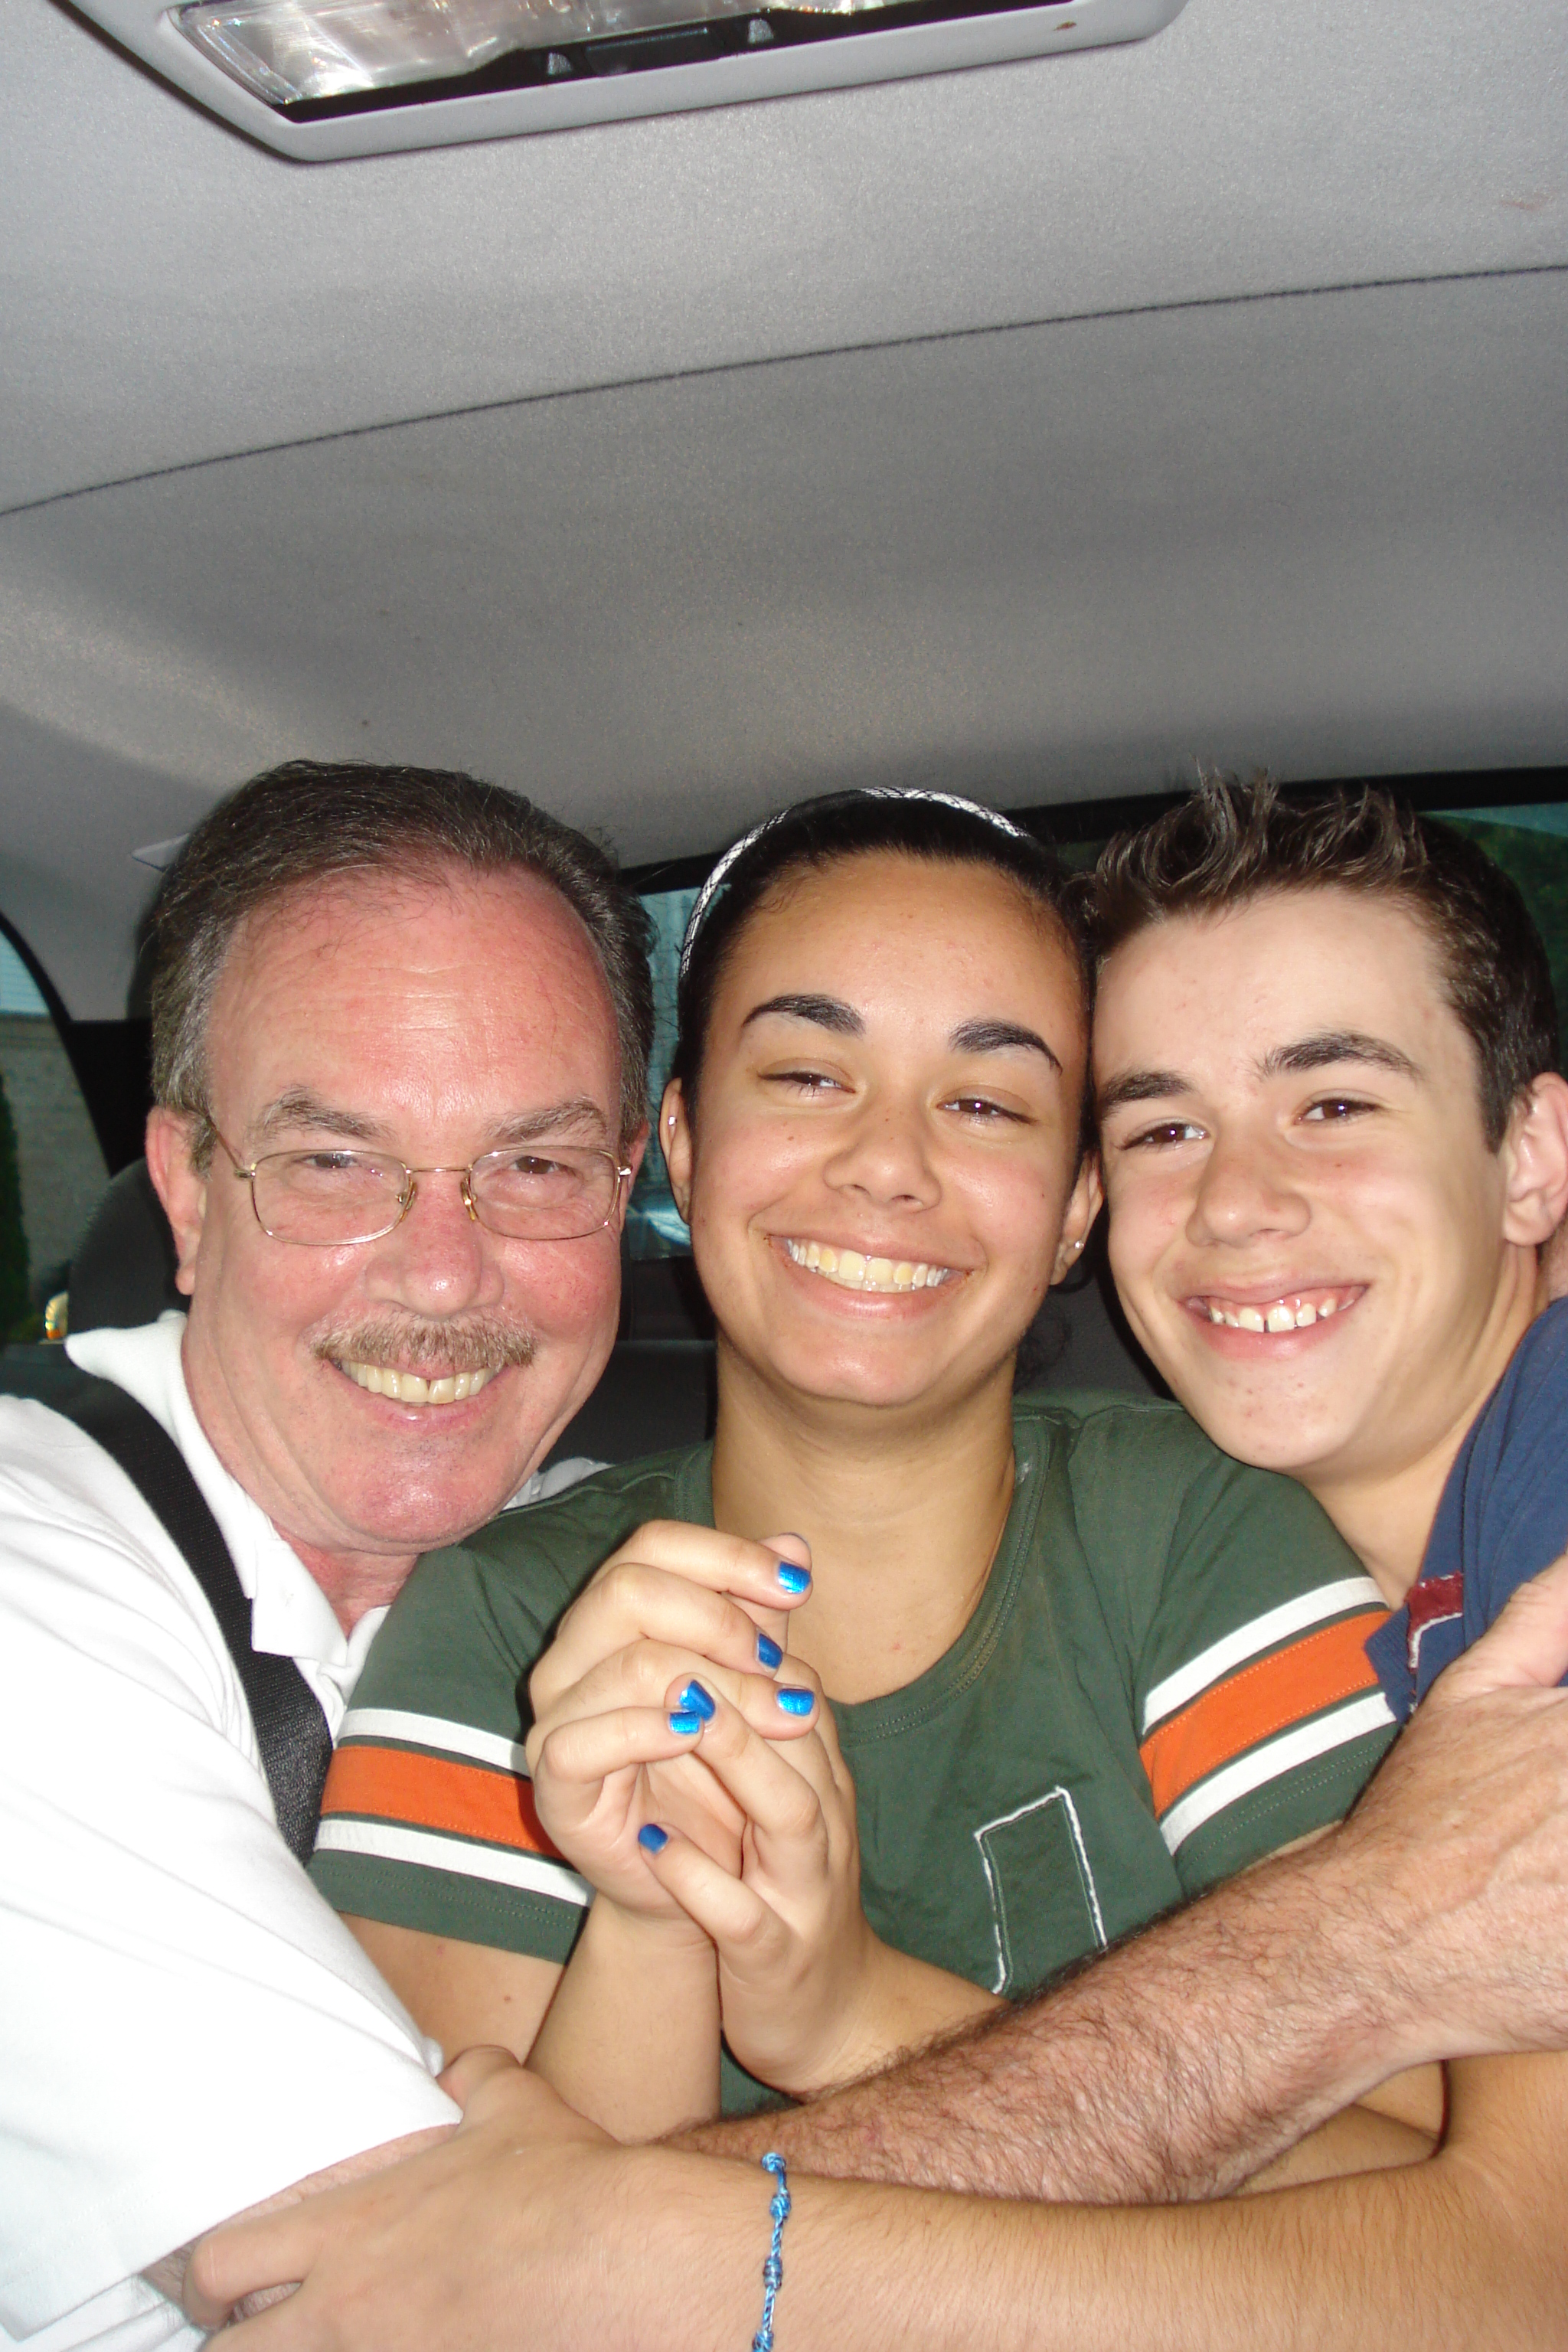 —Jillian's Dad, George Gorman